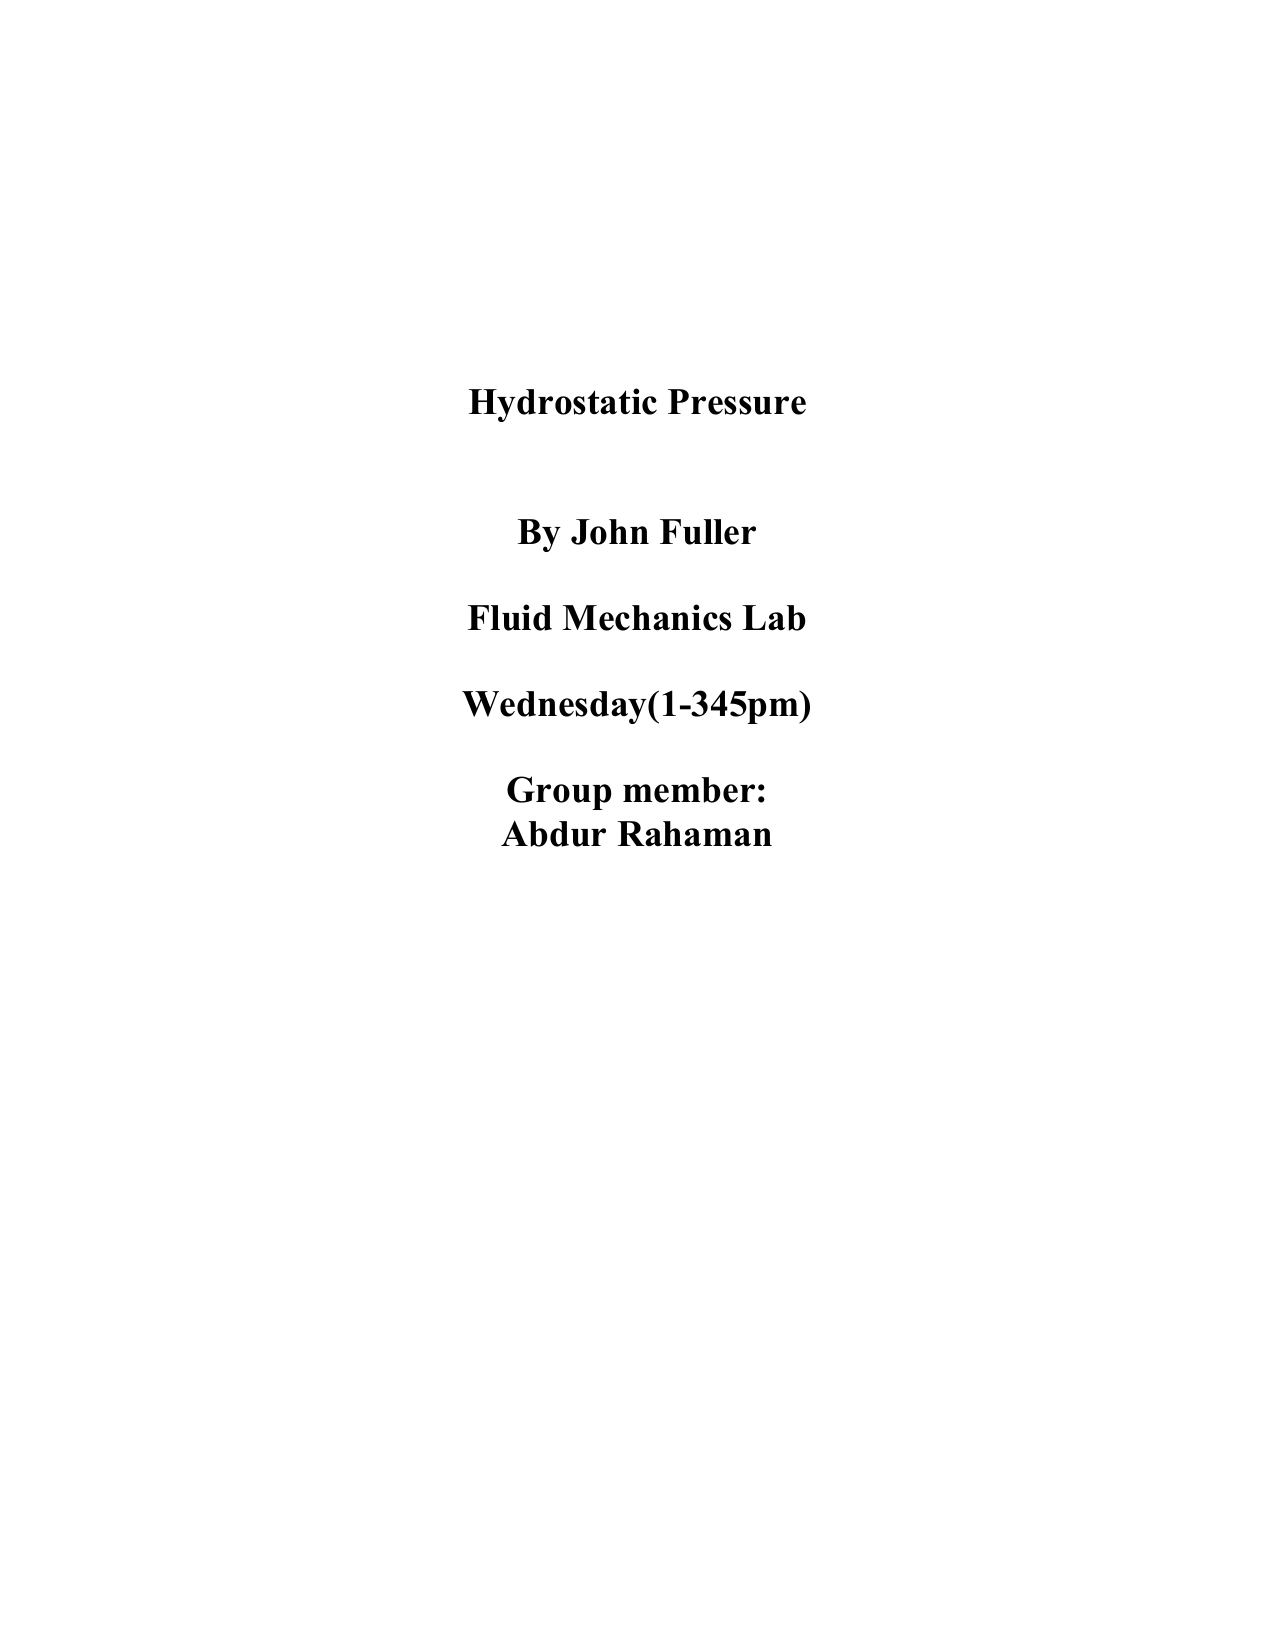 hydrostatic pressure experiment report